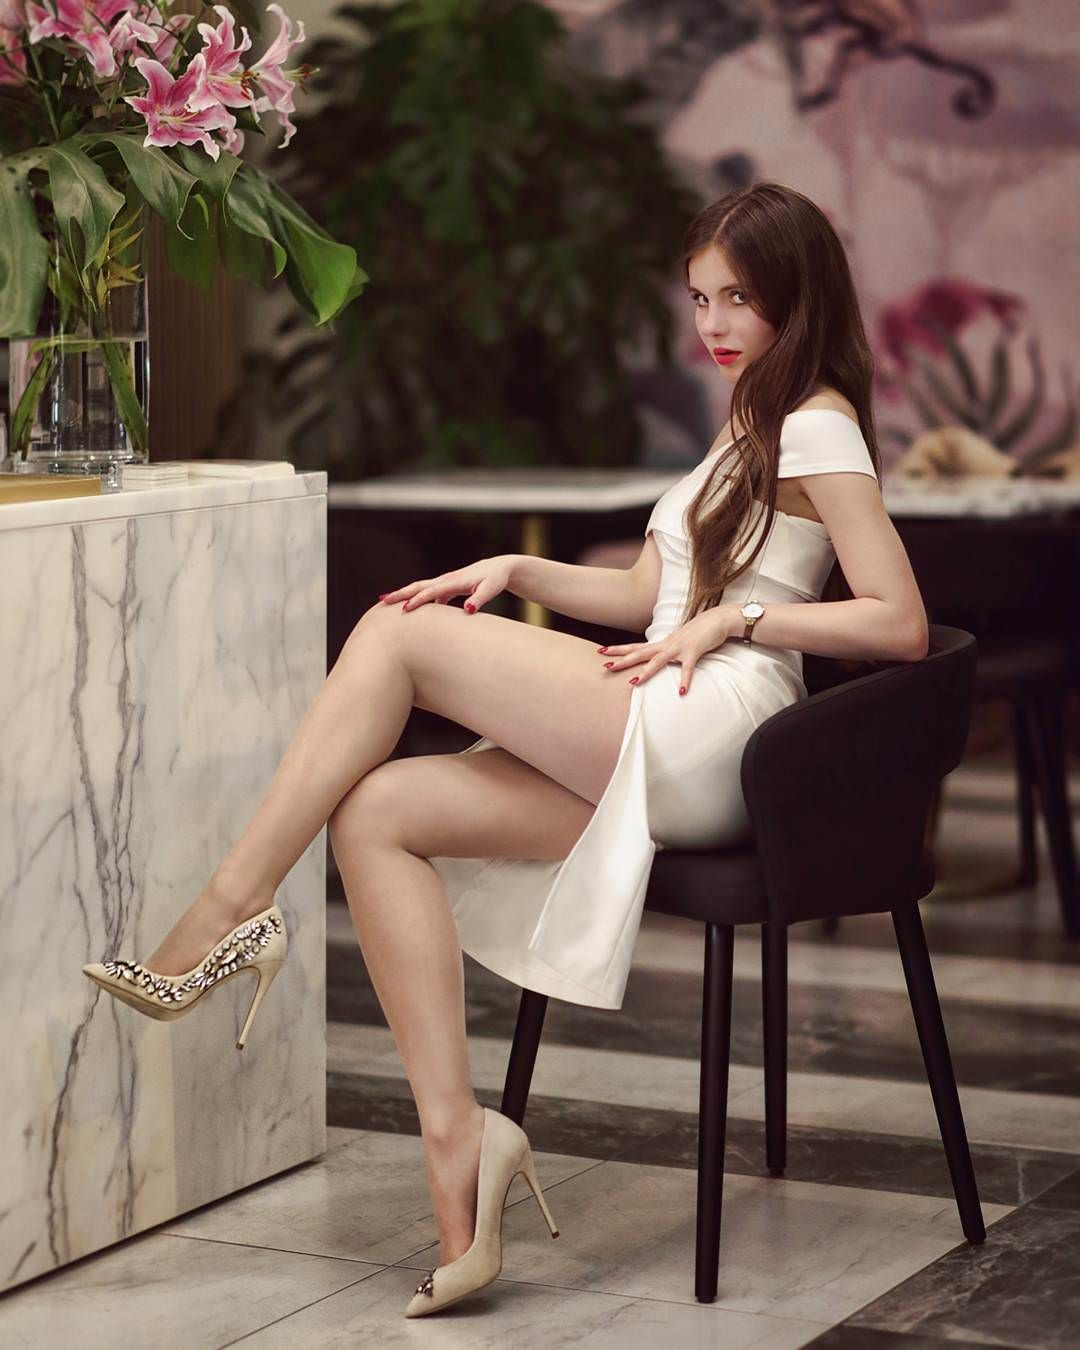 Pin on desirable legs on sexy women